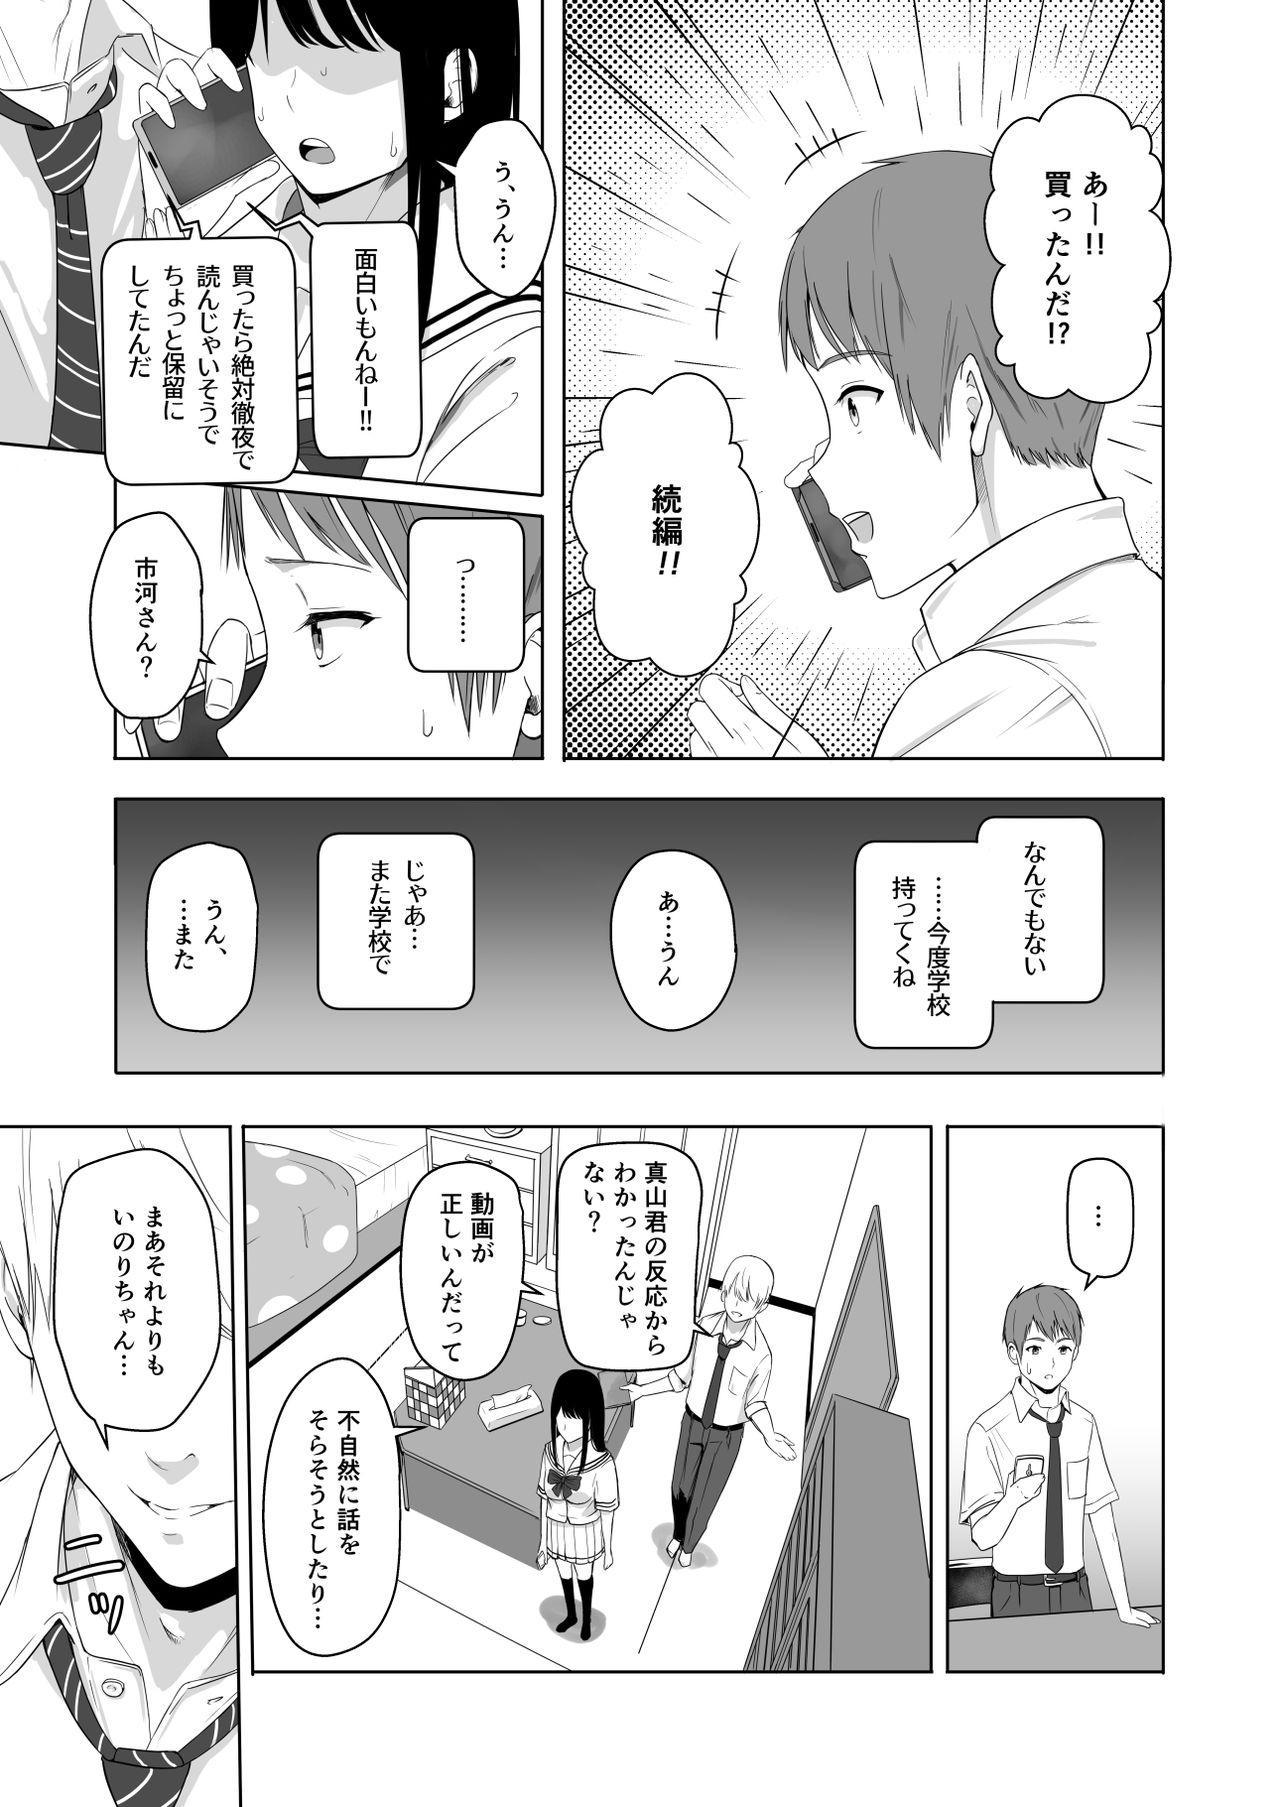 Kimi ga Tame. 2 Ichikawa Inori 45